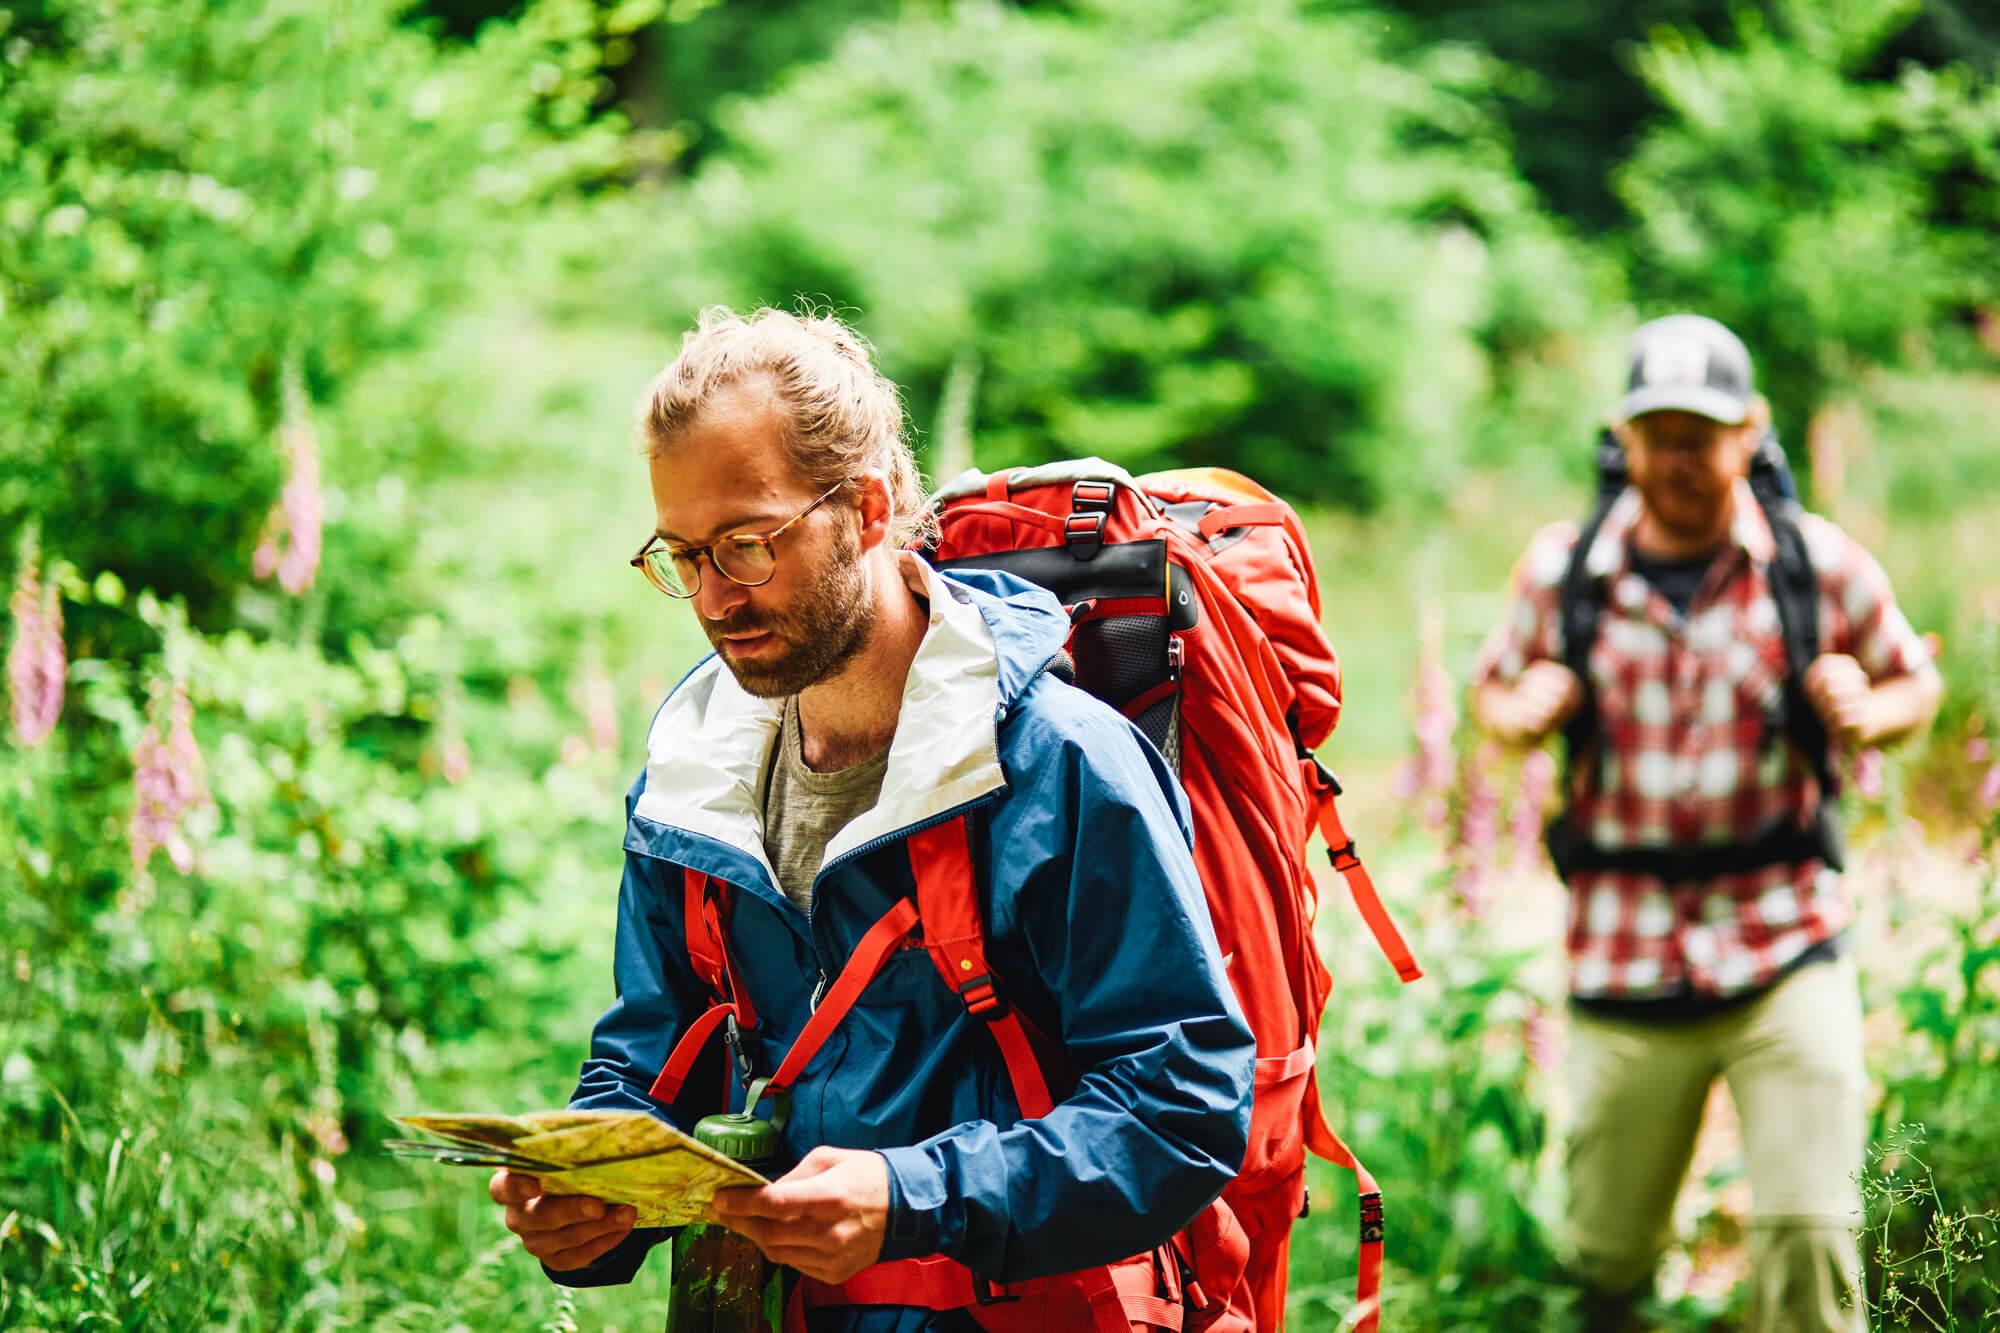 Wandern auf dem Soonwaldsteig im Hunsrück